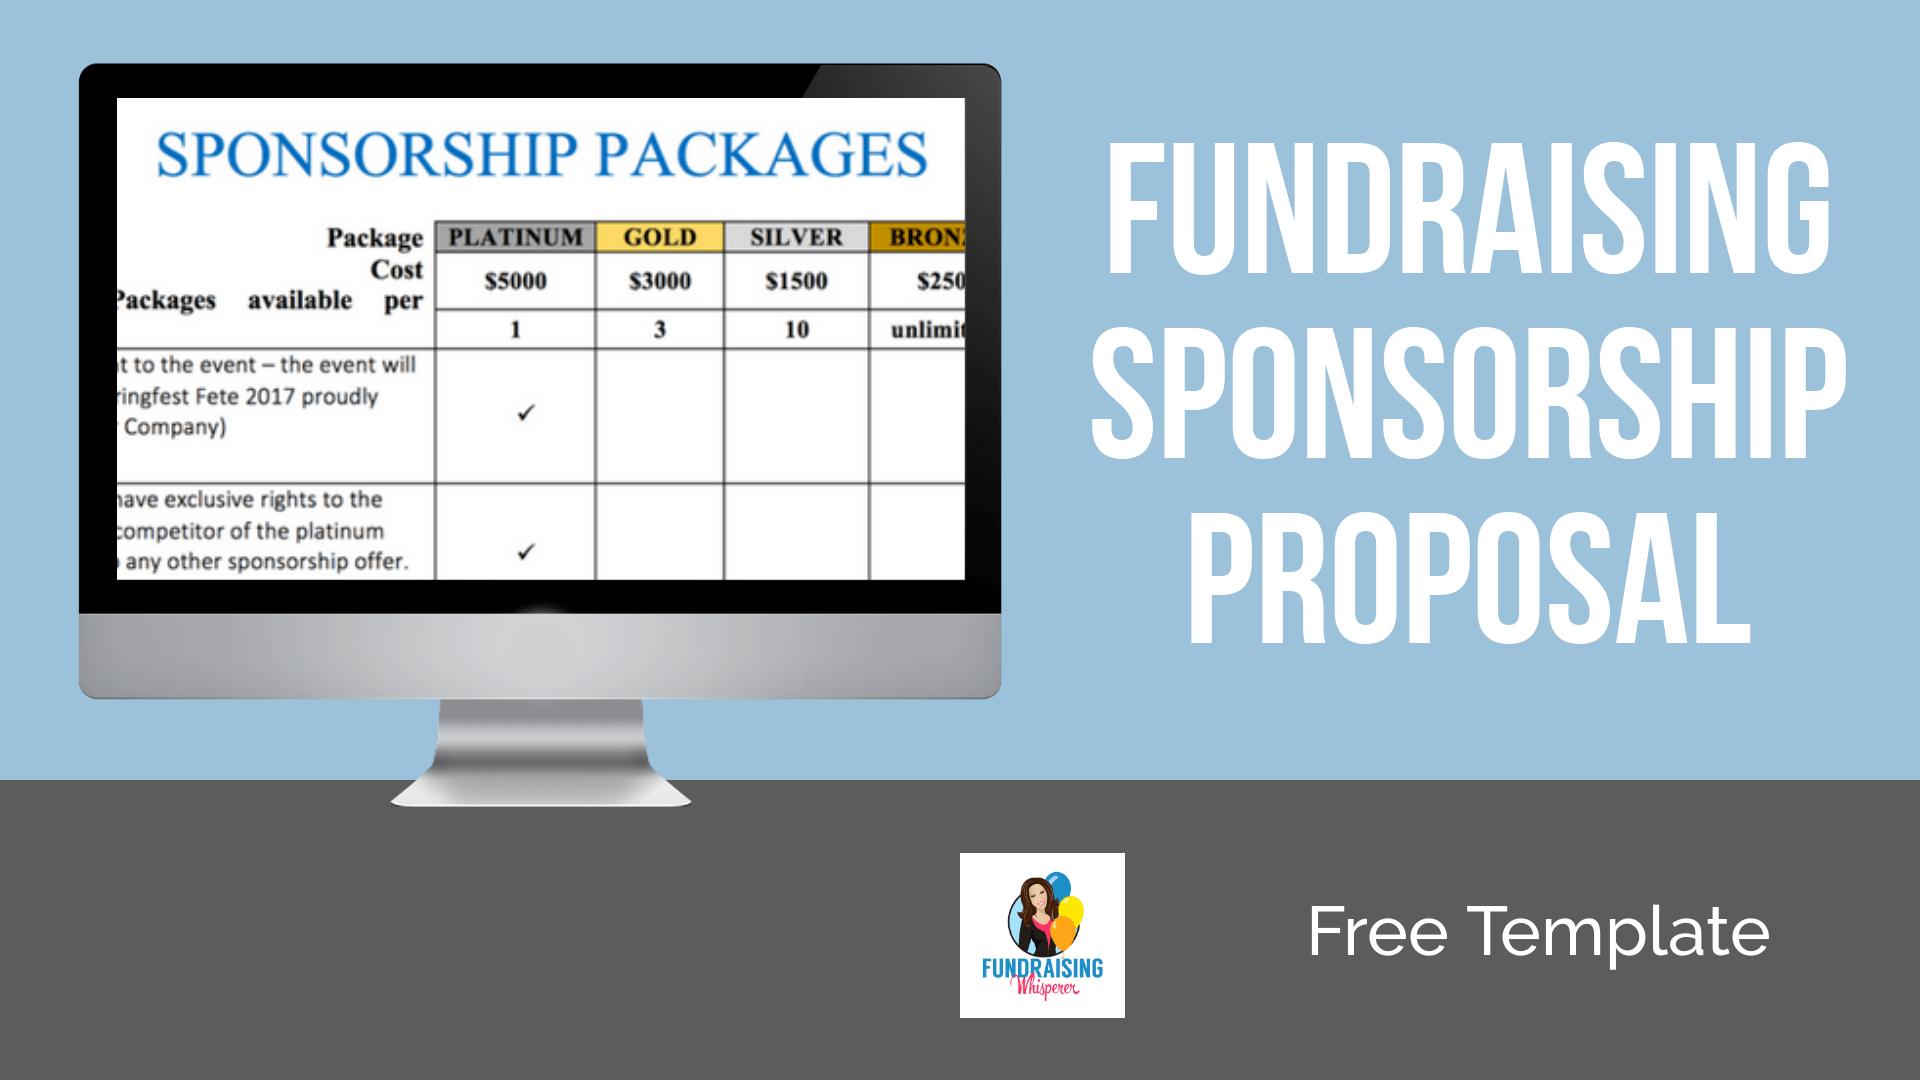 Fundraising Sponsorship Proposal Template - Free